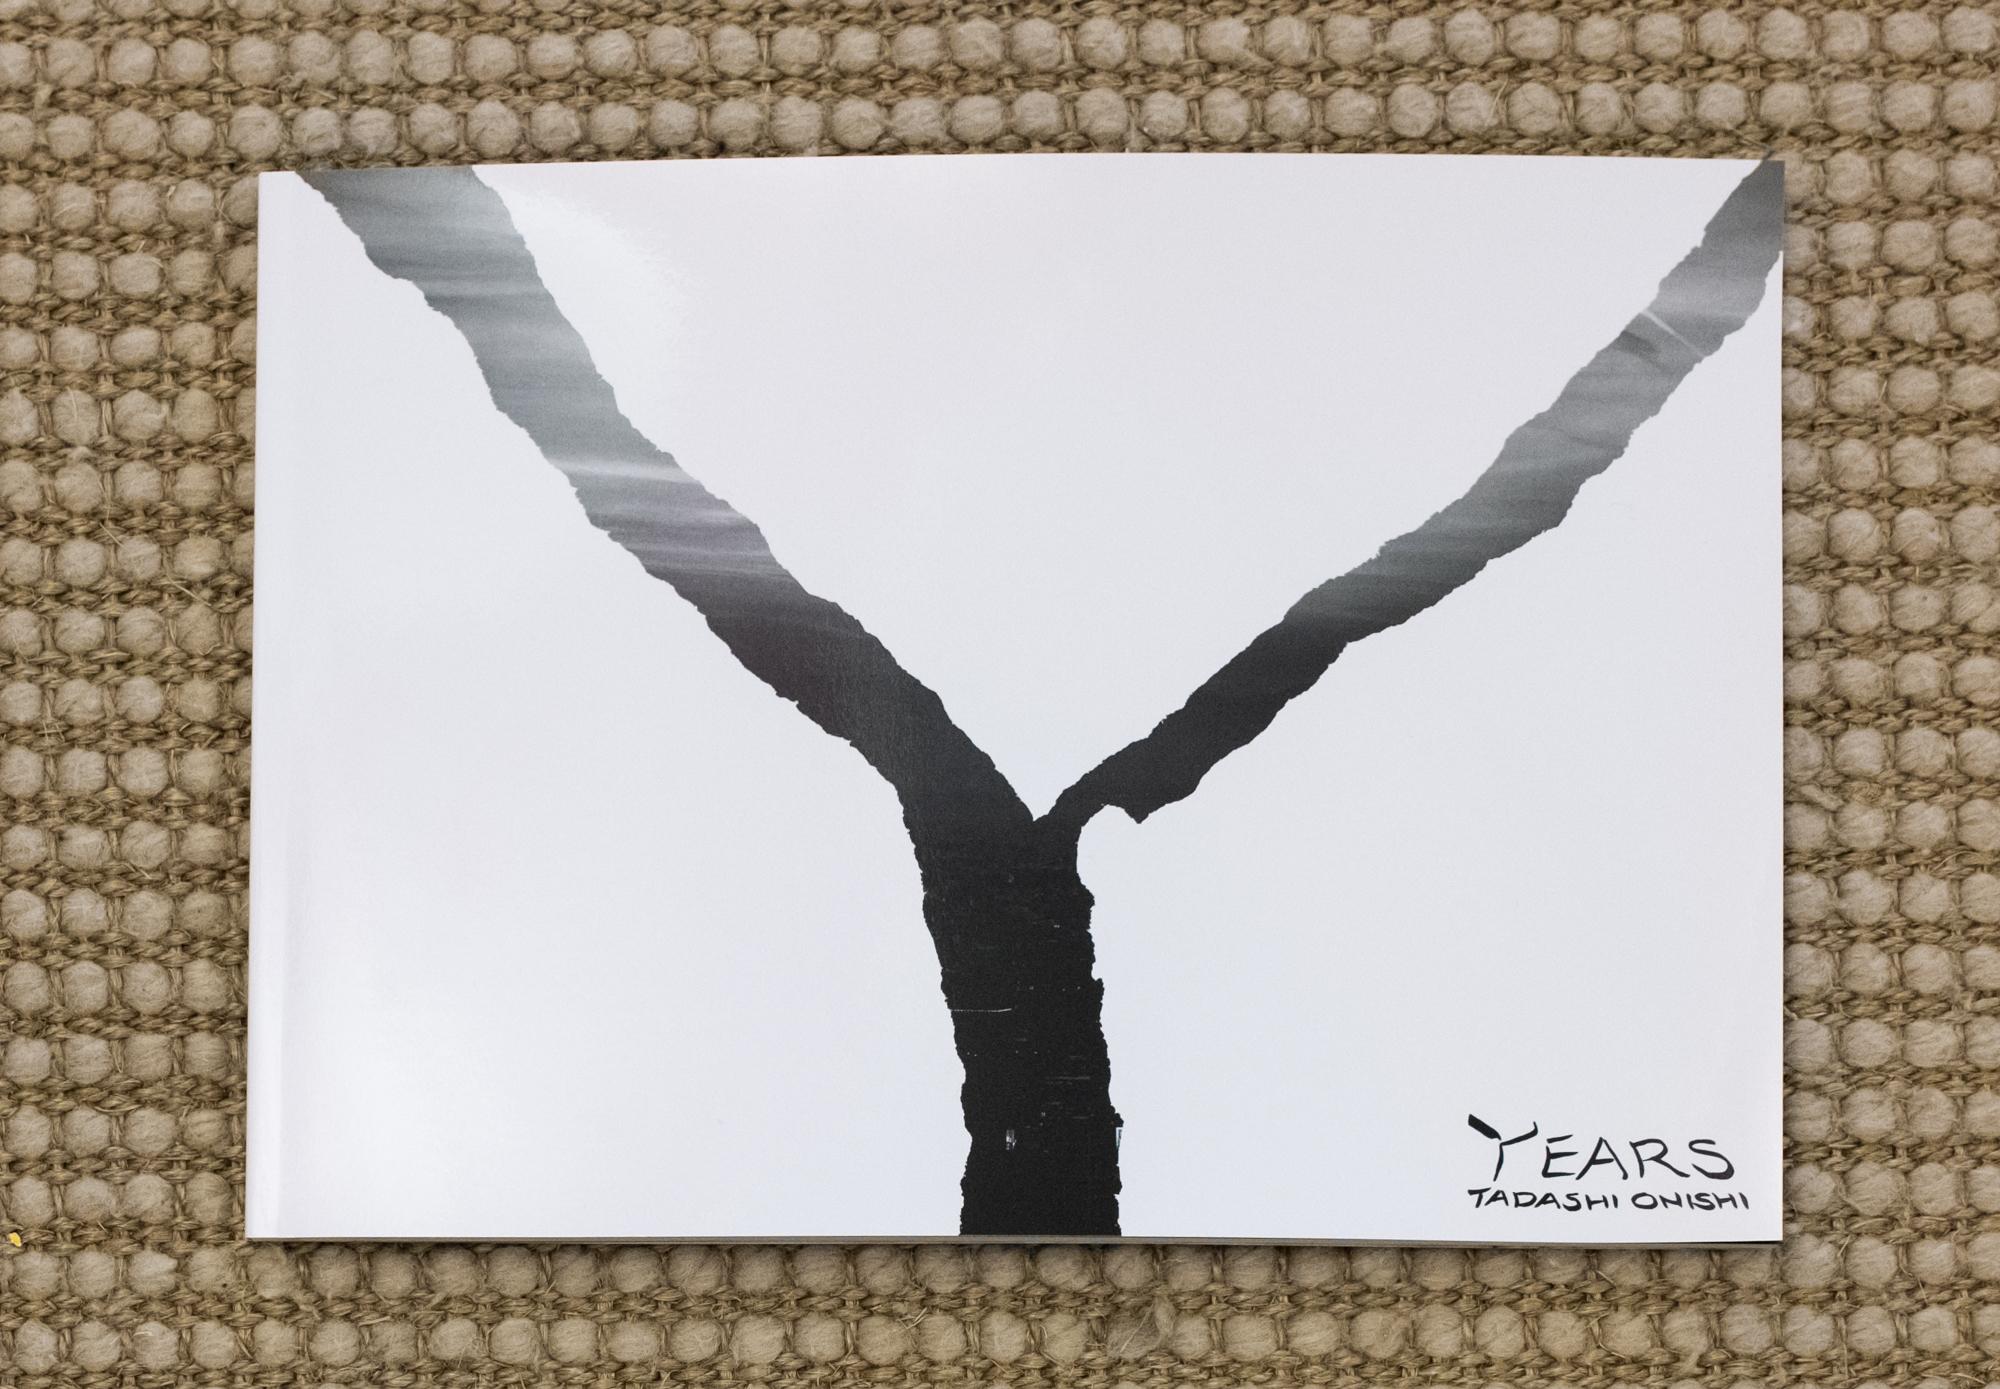 YEARS - 1 (January)